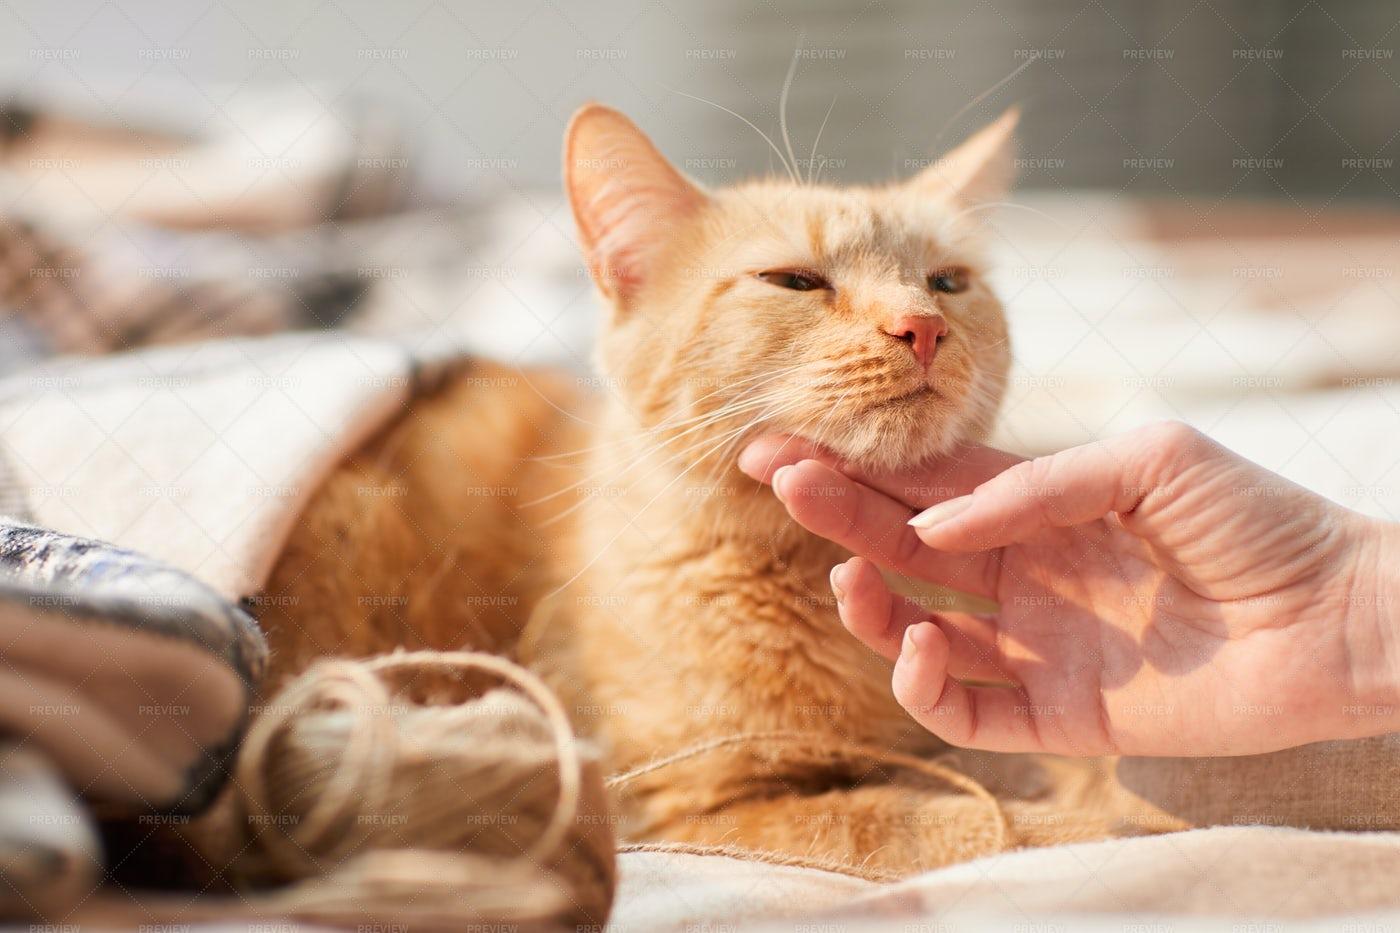 Young Woman Stroking Ginger Cat: Stock Photos